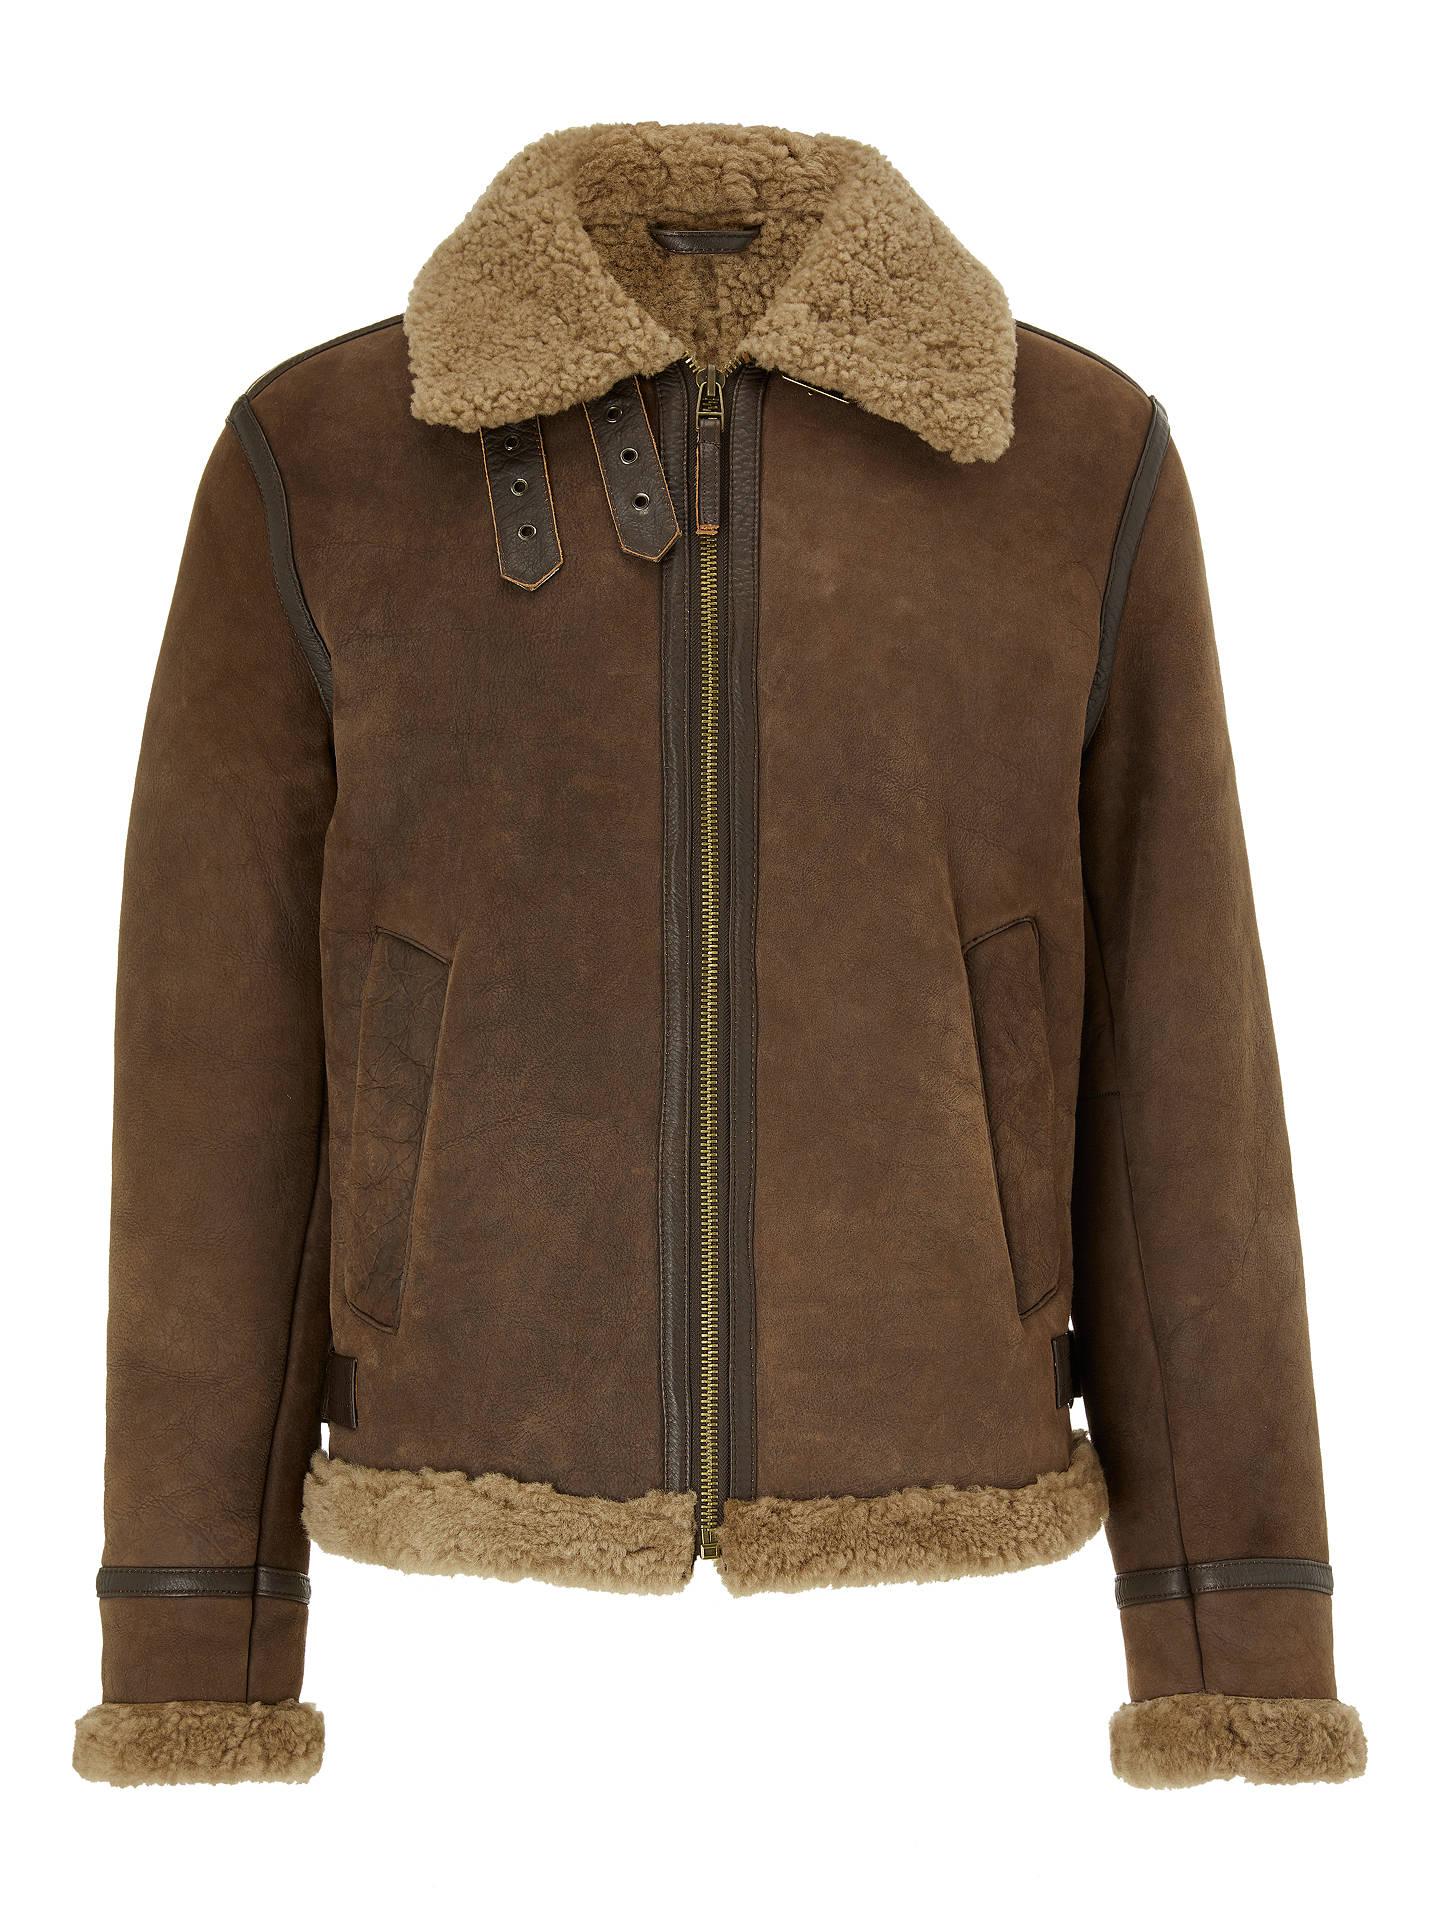 John Lewis Co Shearling Leather Flight Jacket Chestnut At John